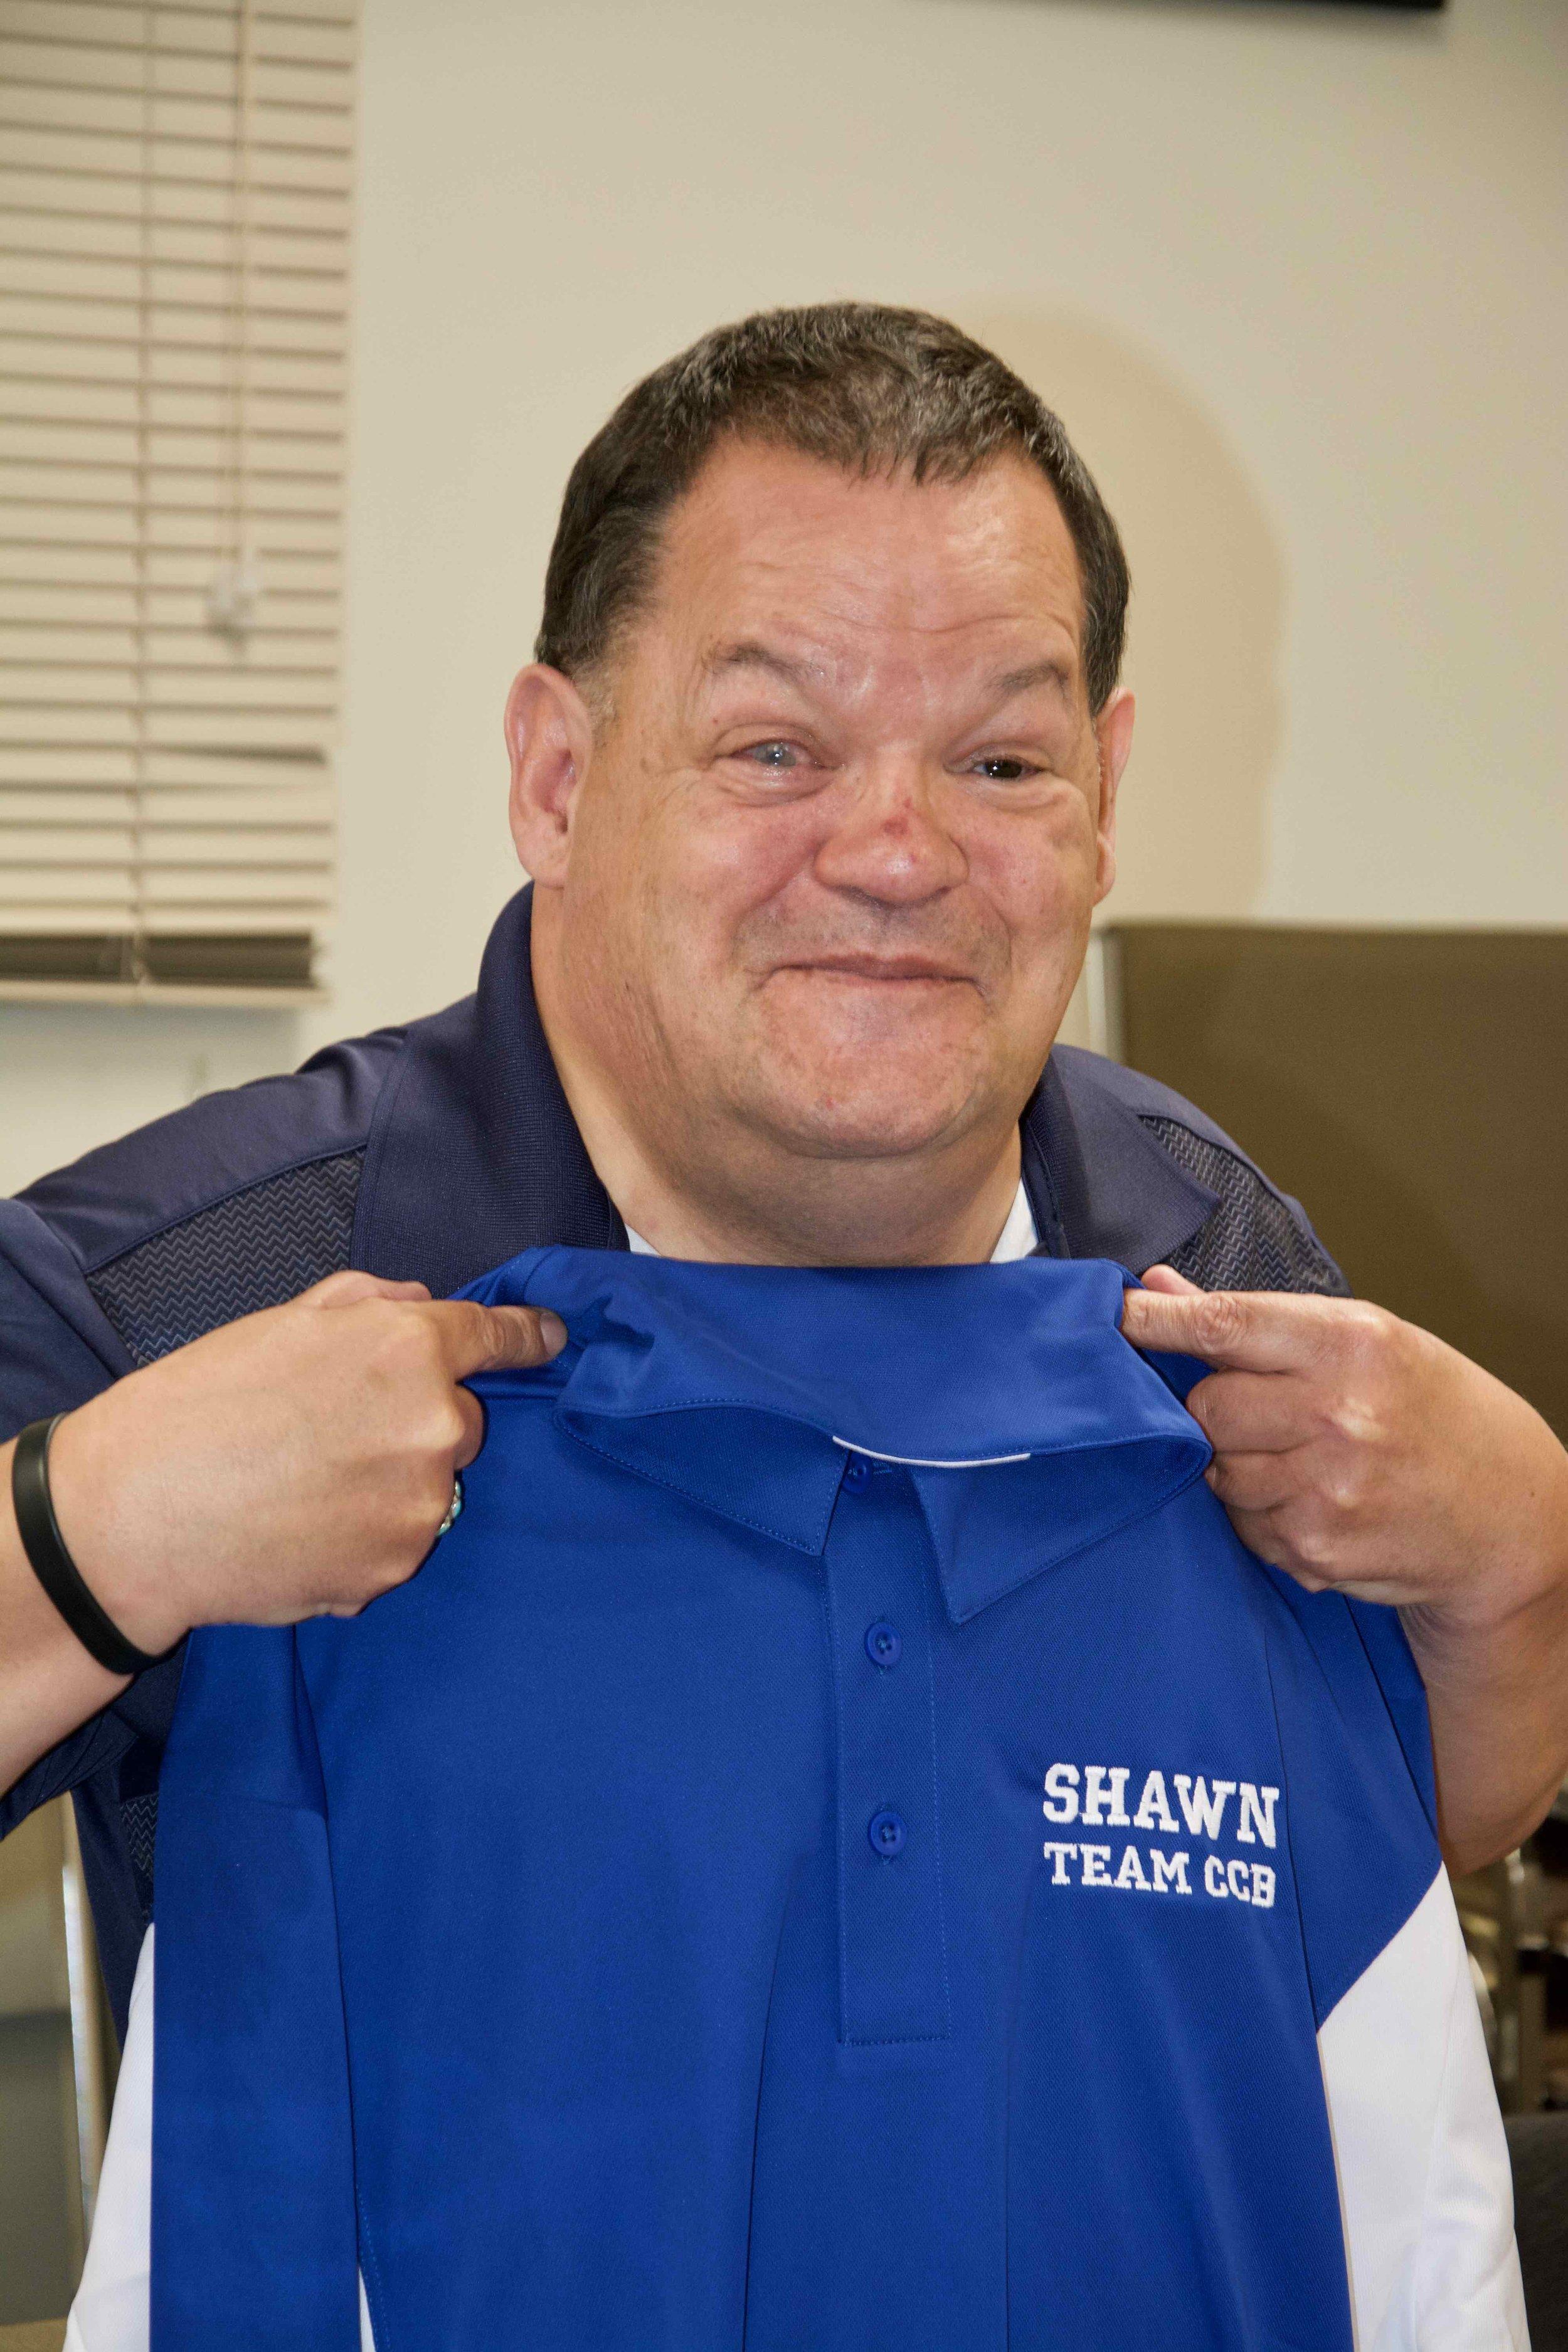 Shawn Johnson enjoying his new bowling shirt